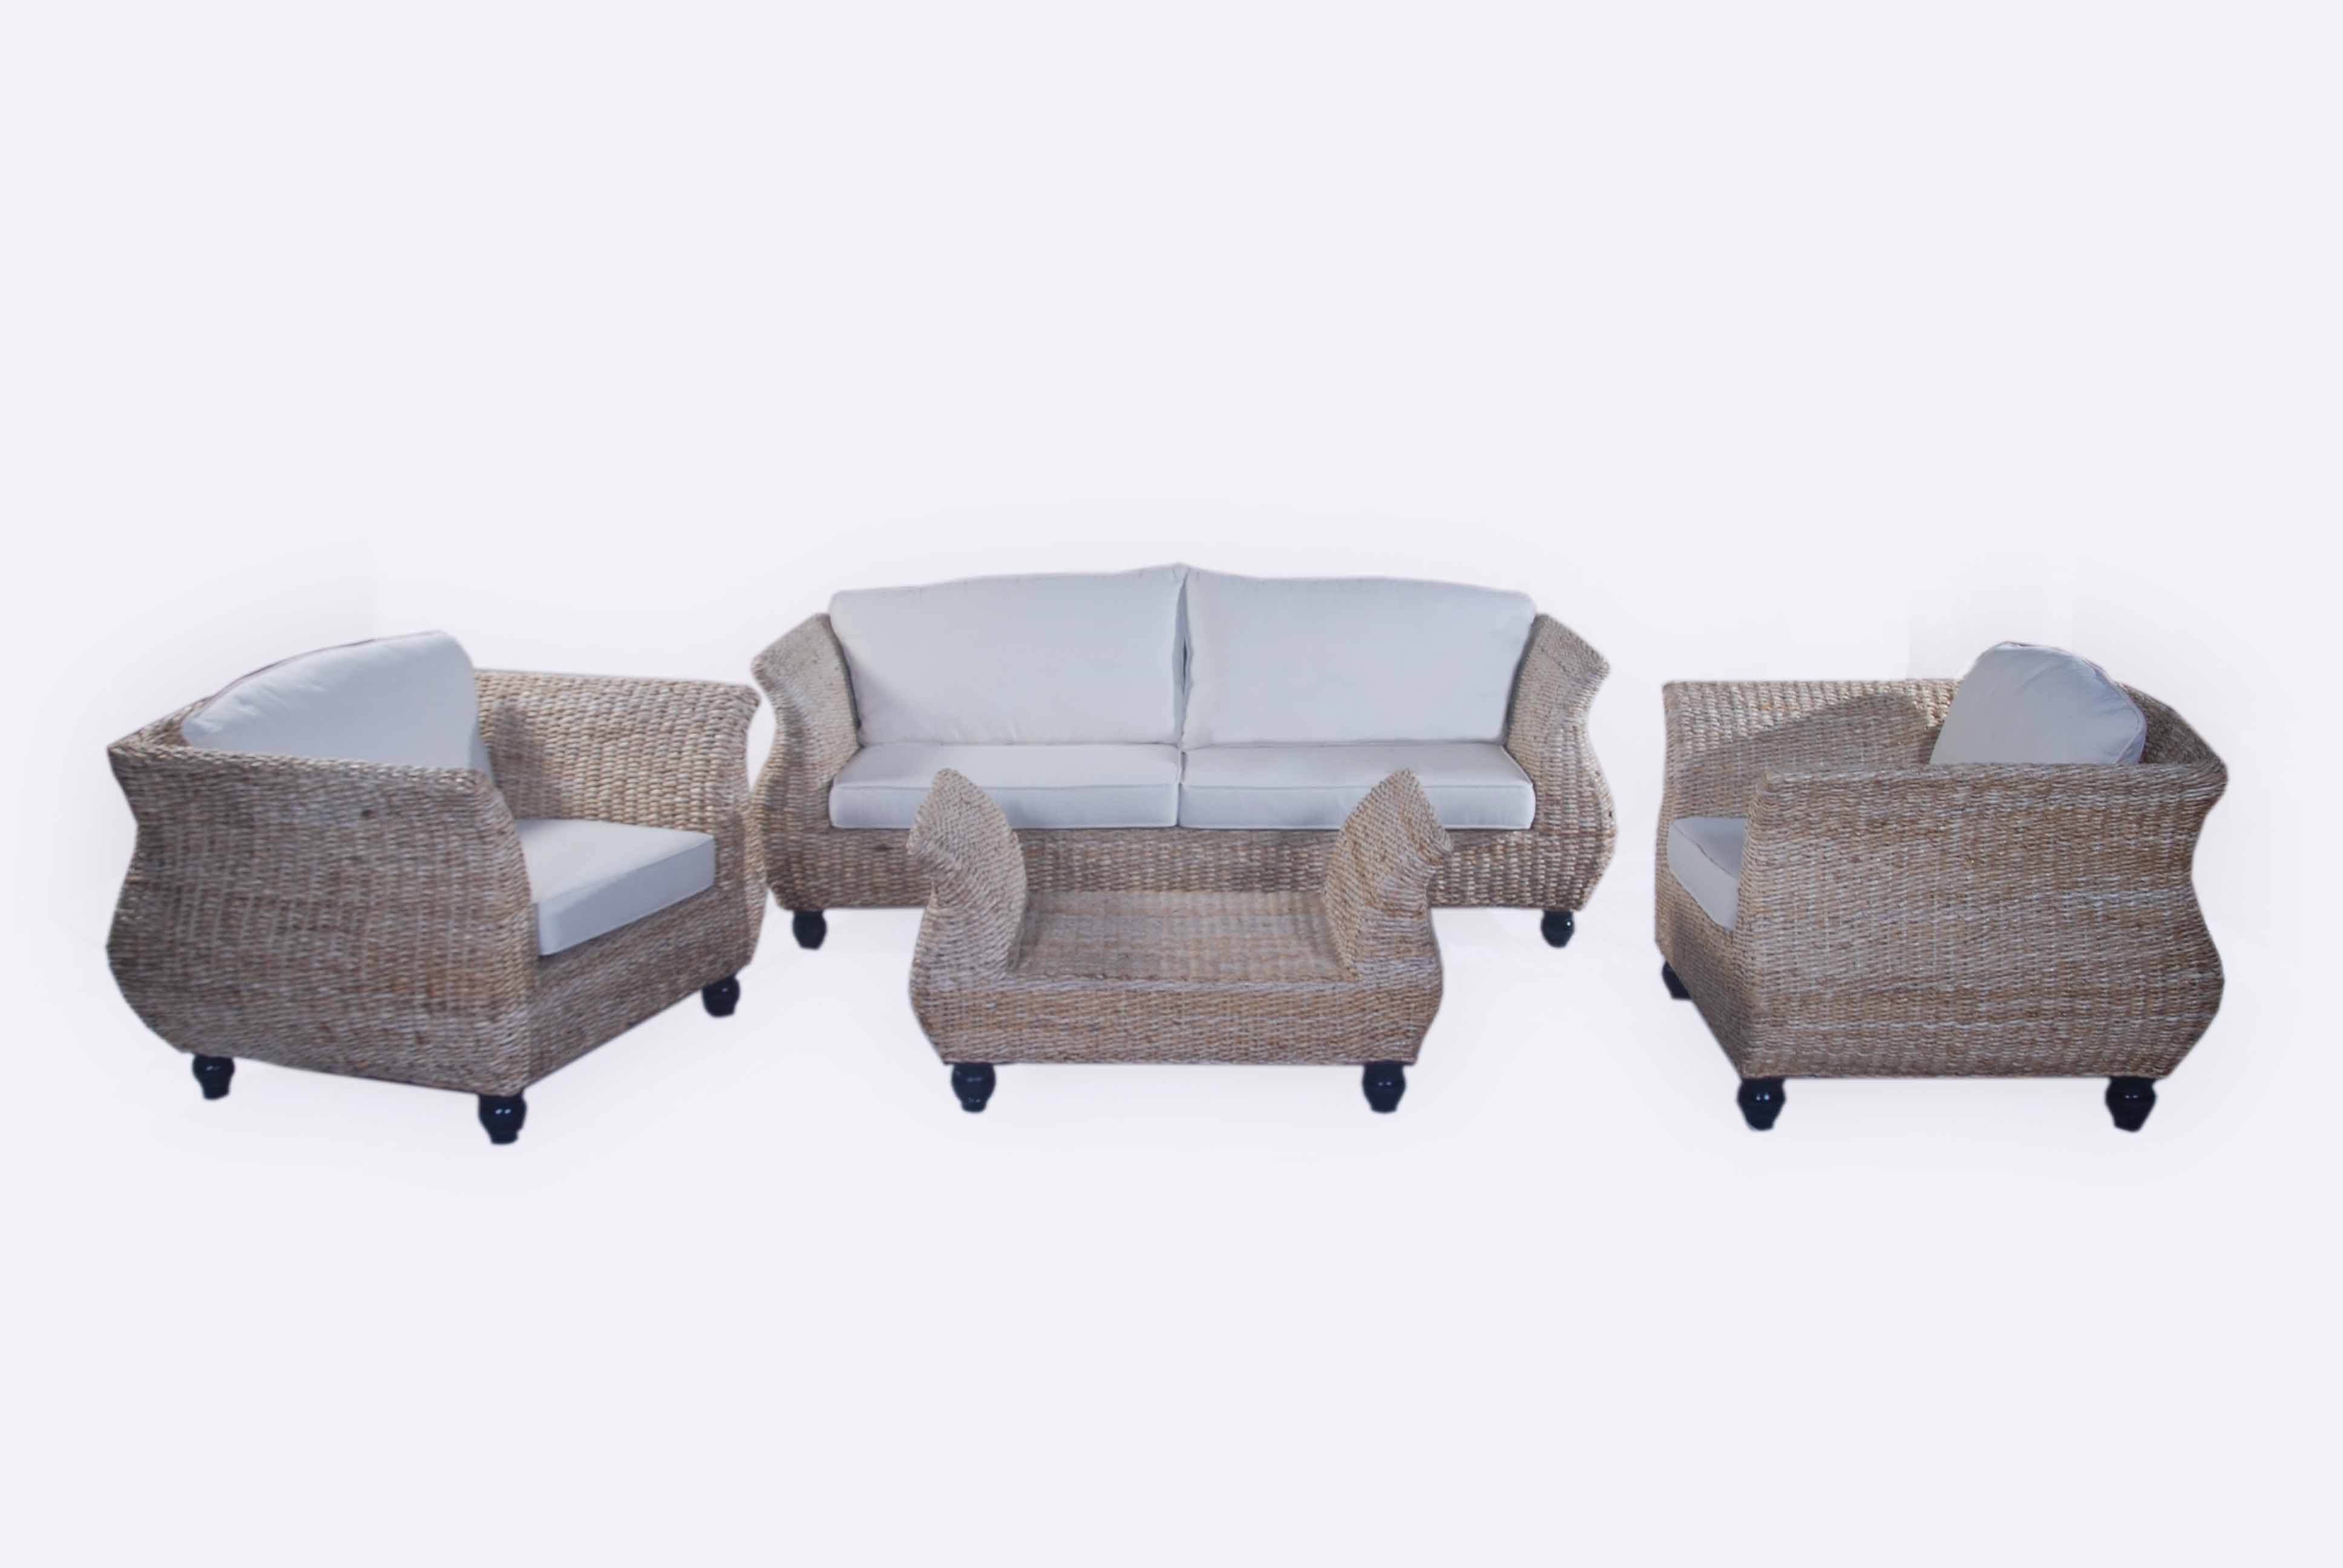 Rattan Furniture Maintenance